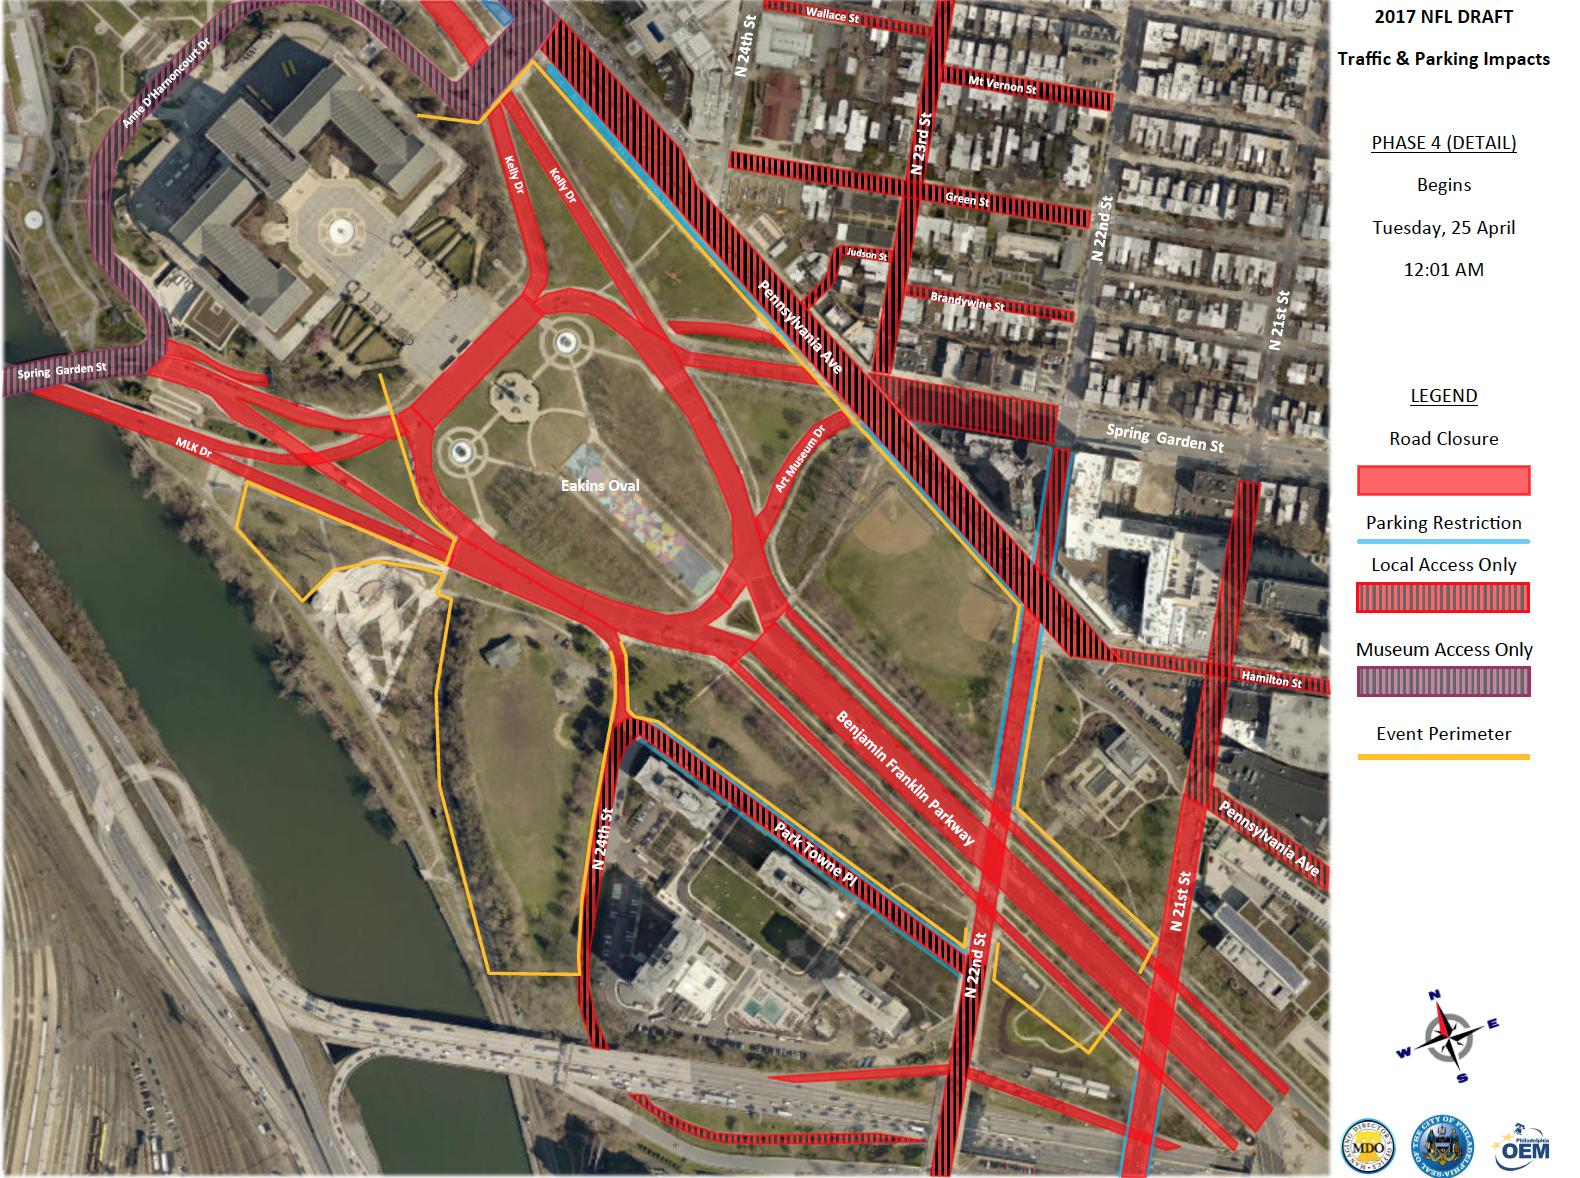 nfl draft in philadelphia road closures detours and parking